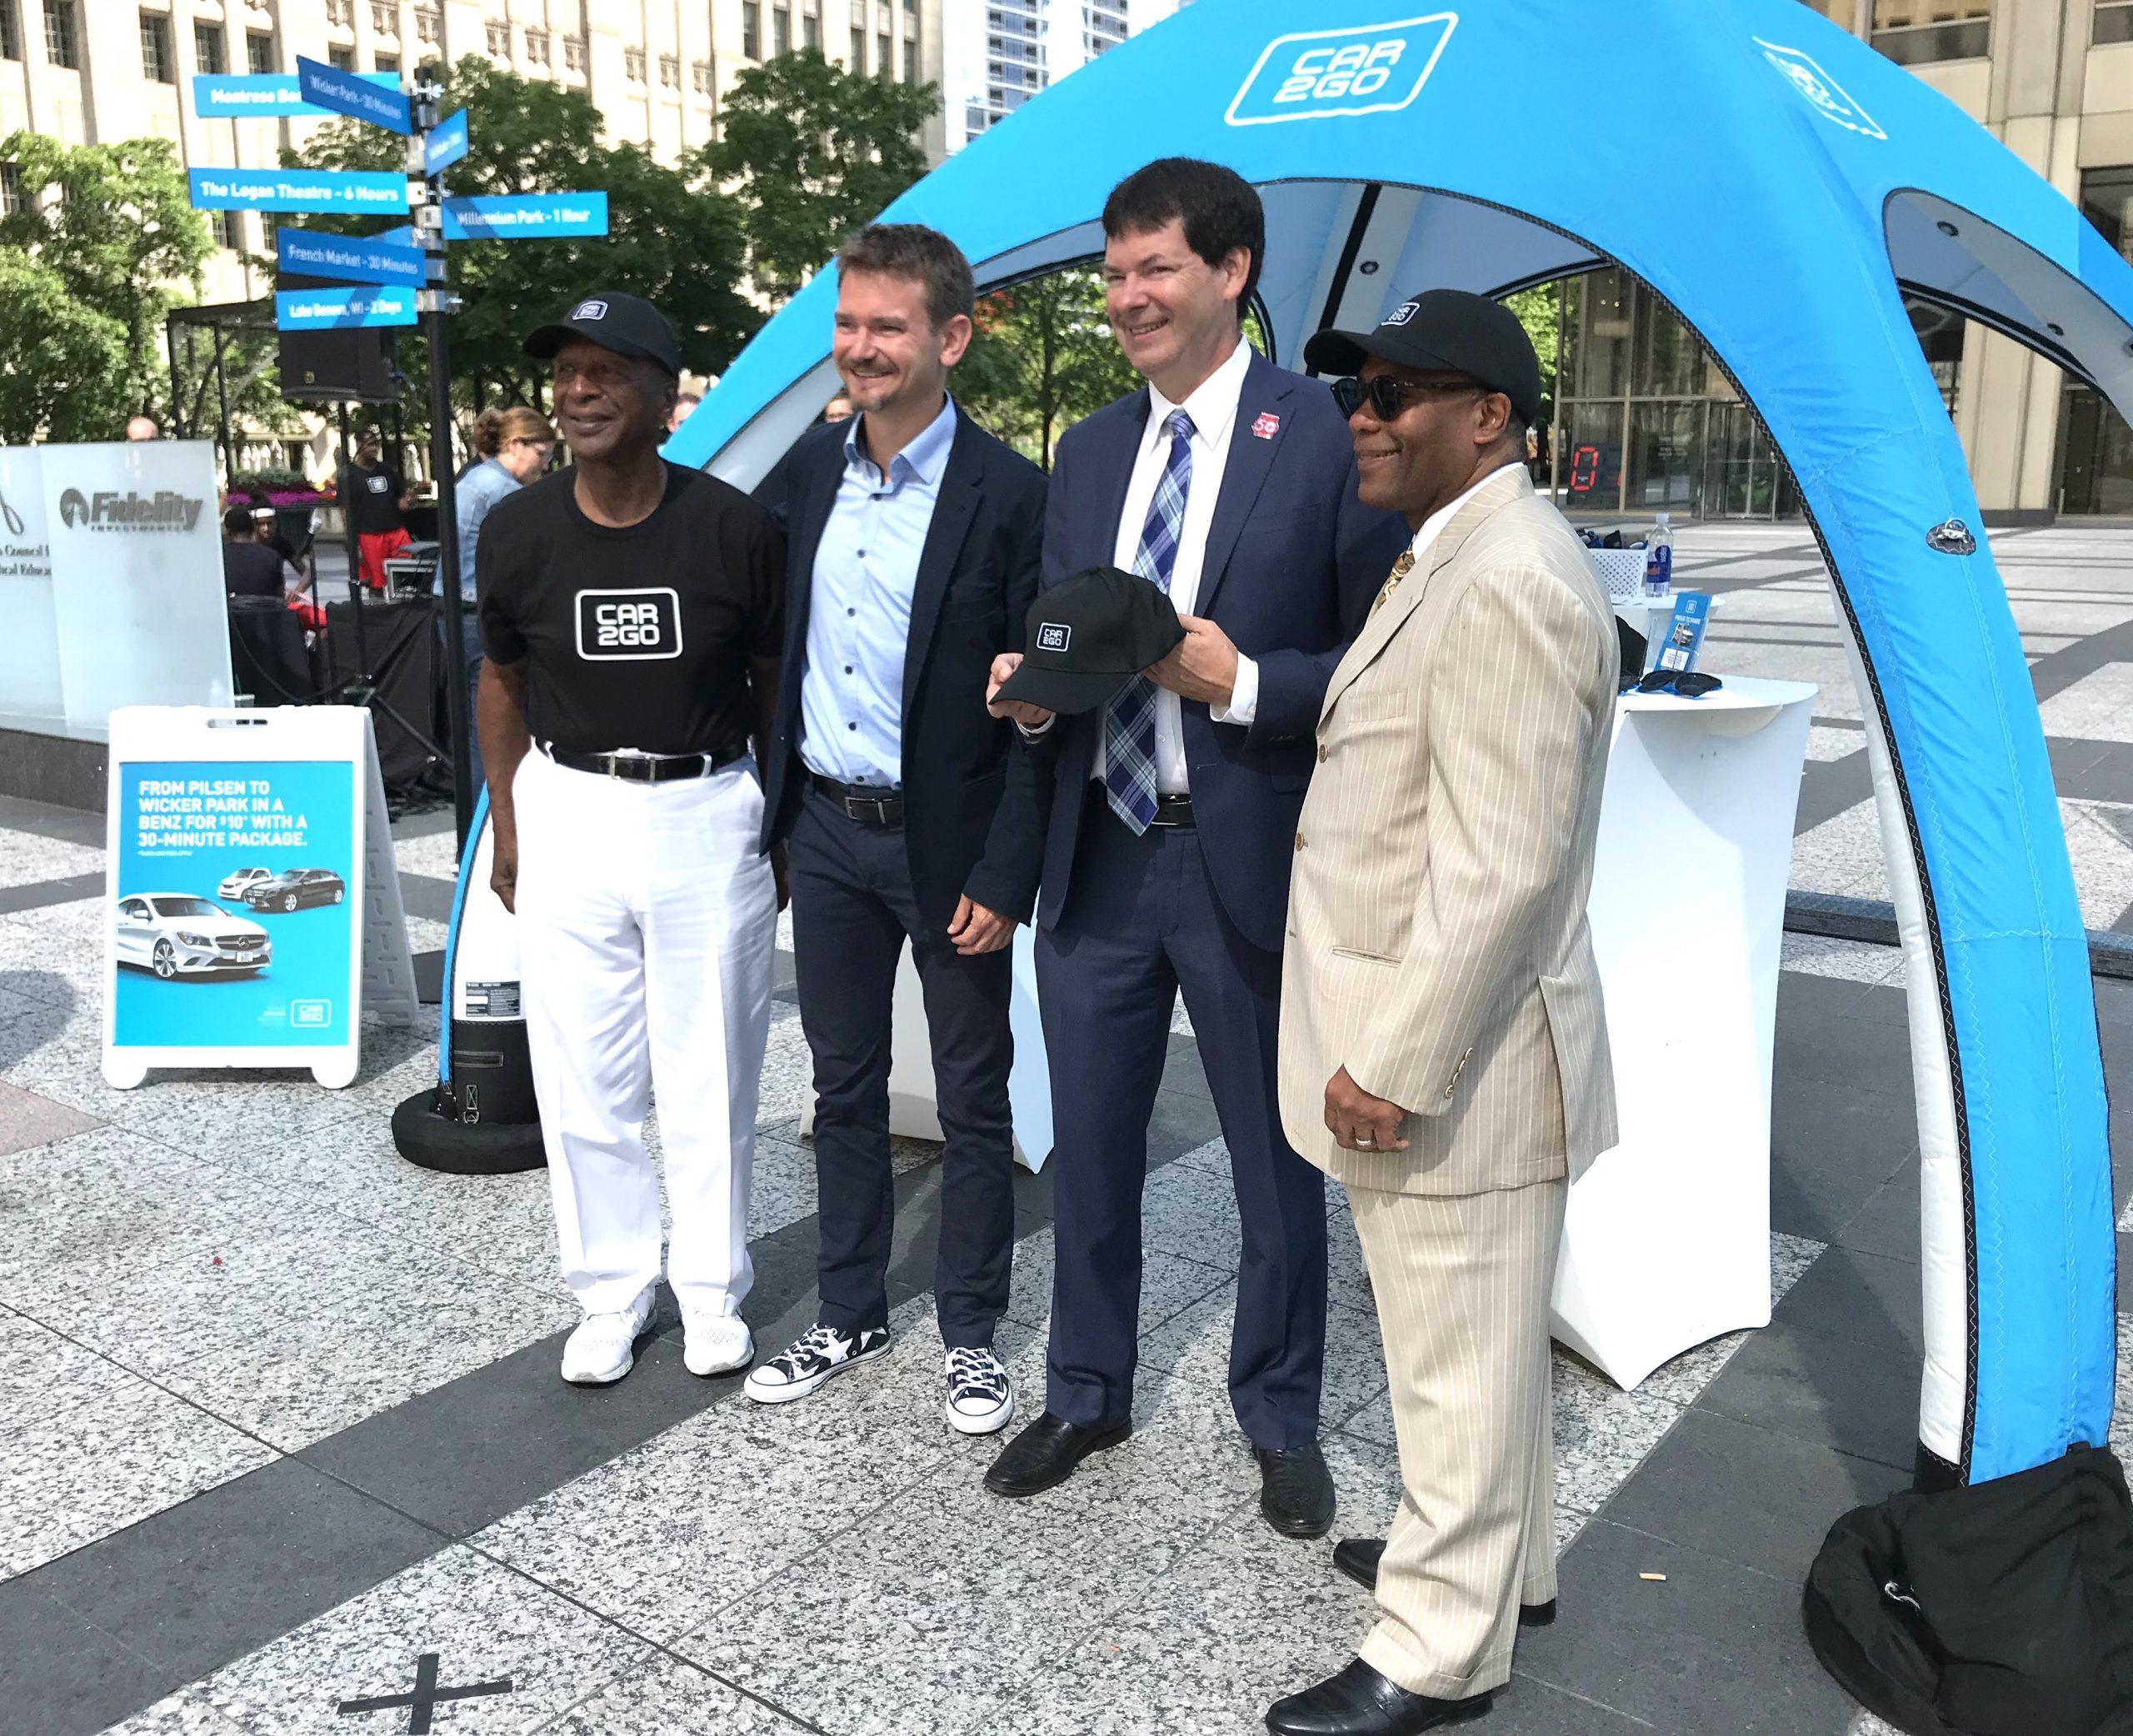 Illinois secretary of state Jesse White, Car2go CEO Olivier Reppert, and aldermen Brian Hopkins and Walter Burnett.